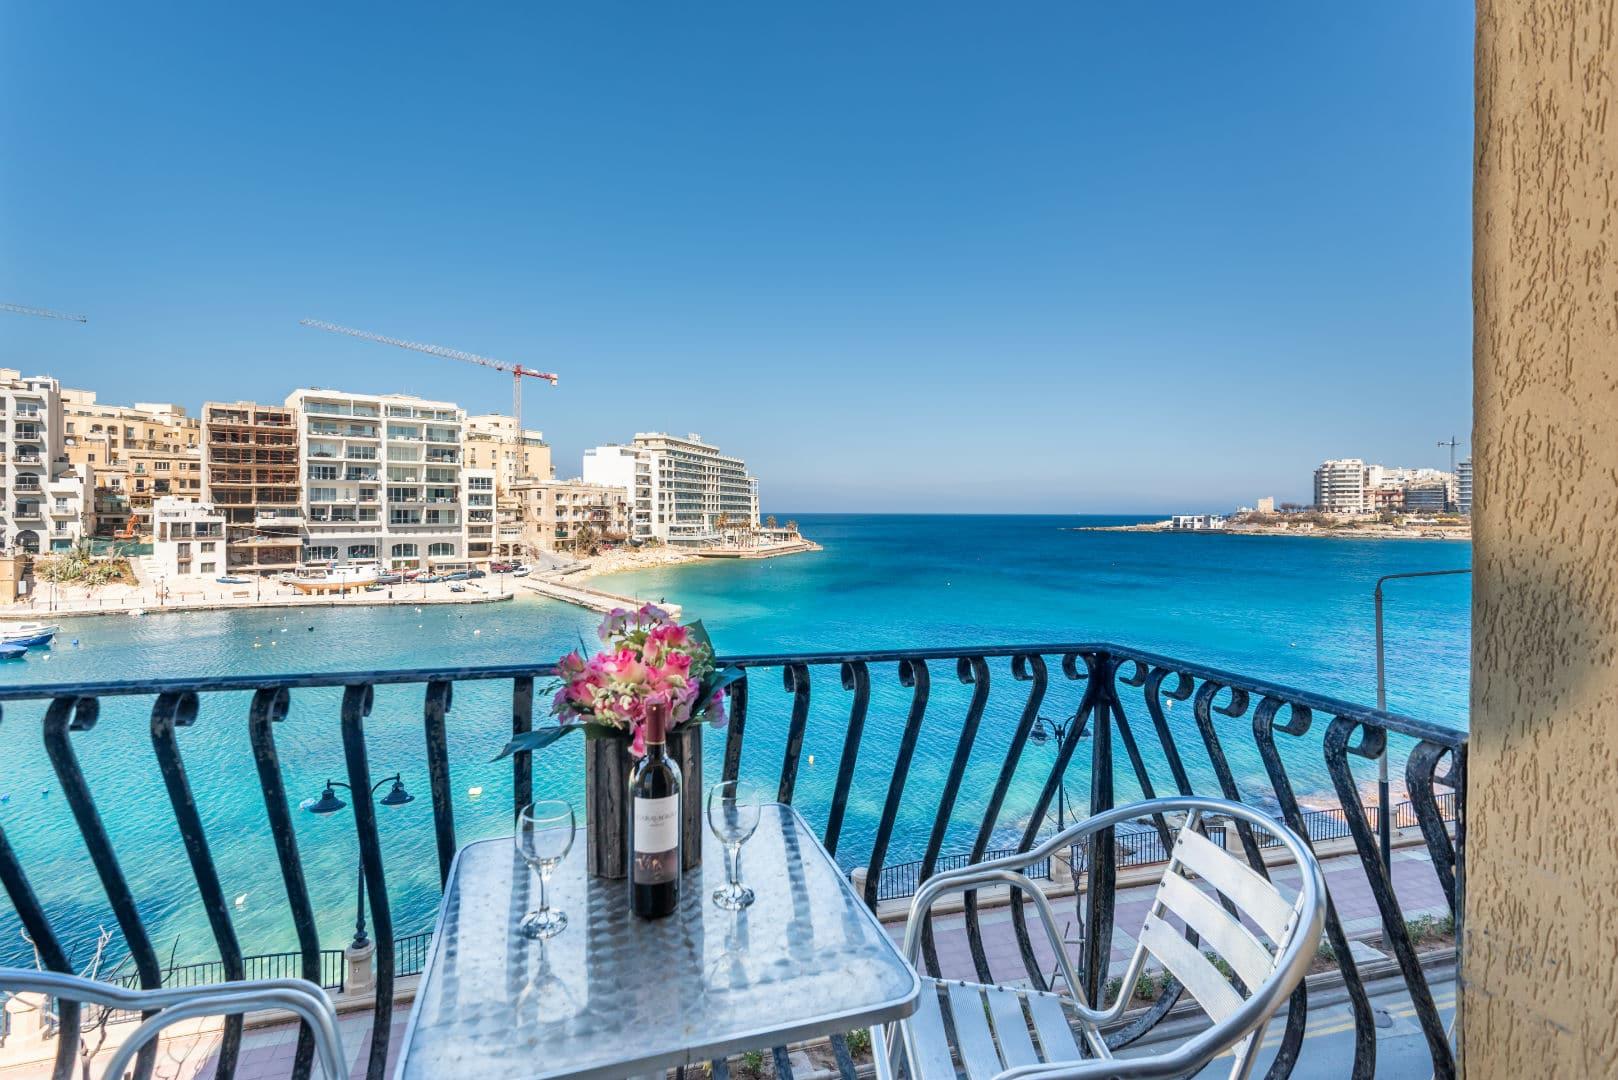 Best Area to Stay in Malta - Apartments Malta St Julians